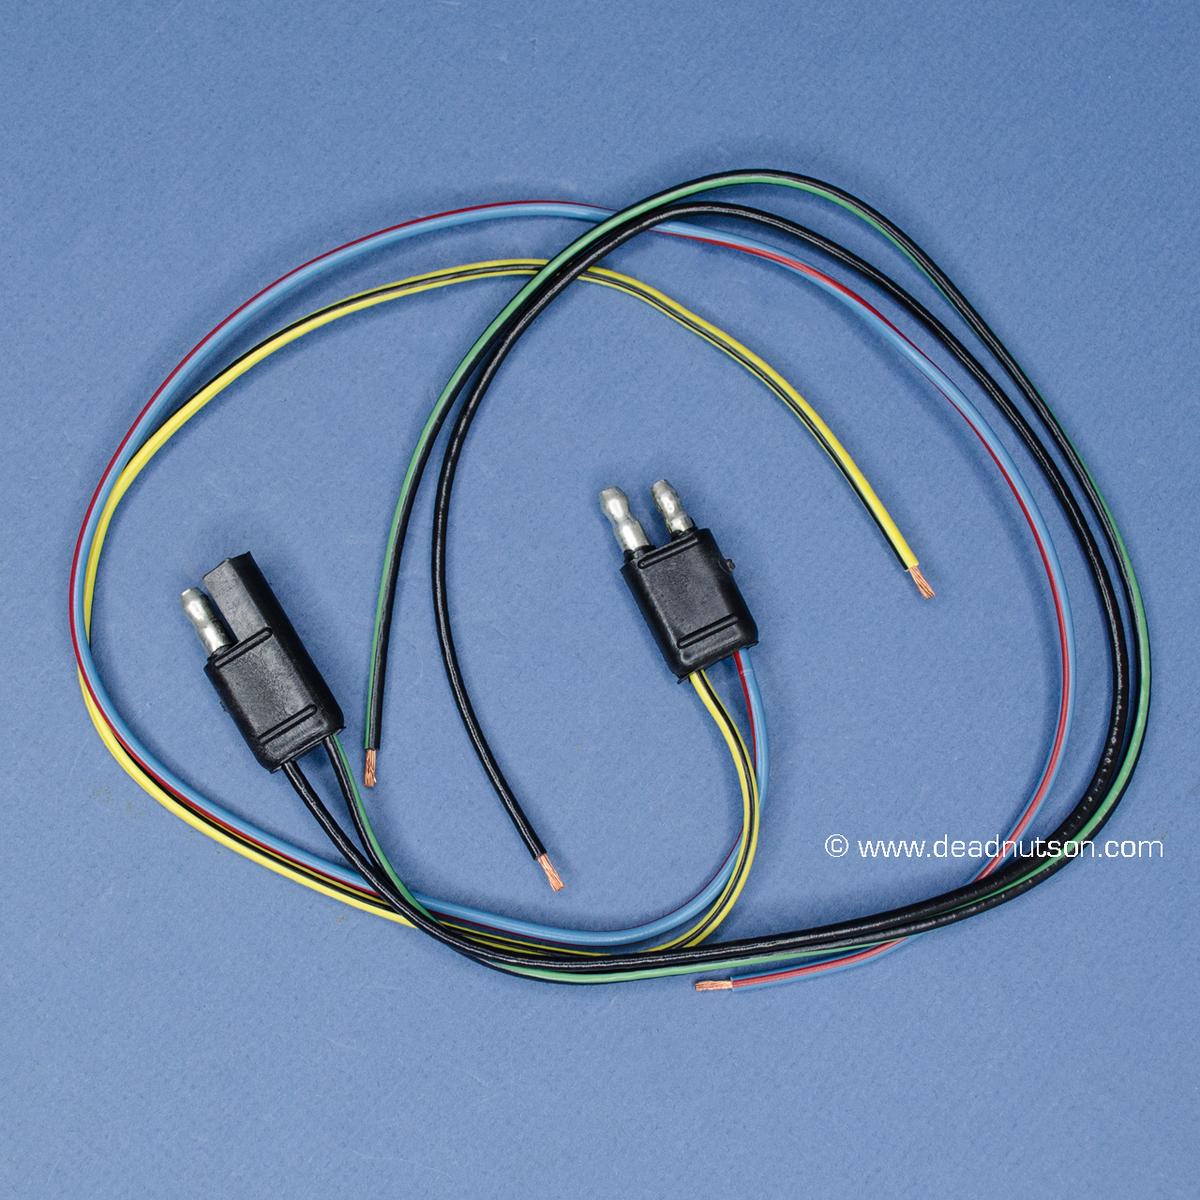 1967 70 mustang am radio wiring repair harness set 2004 ford f150 radio wiring diagram mustang radio amp bypass wire (93 00